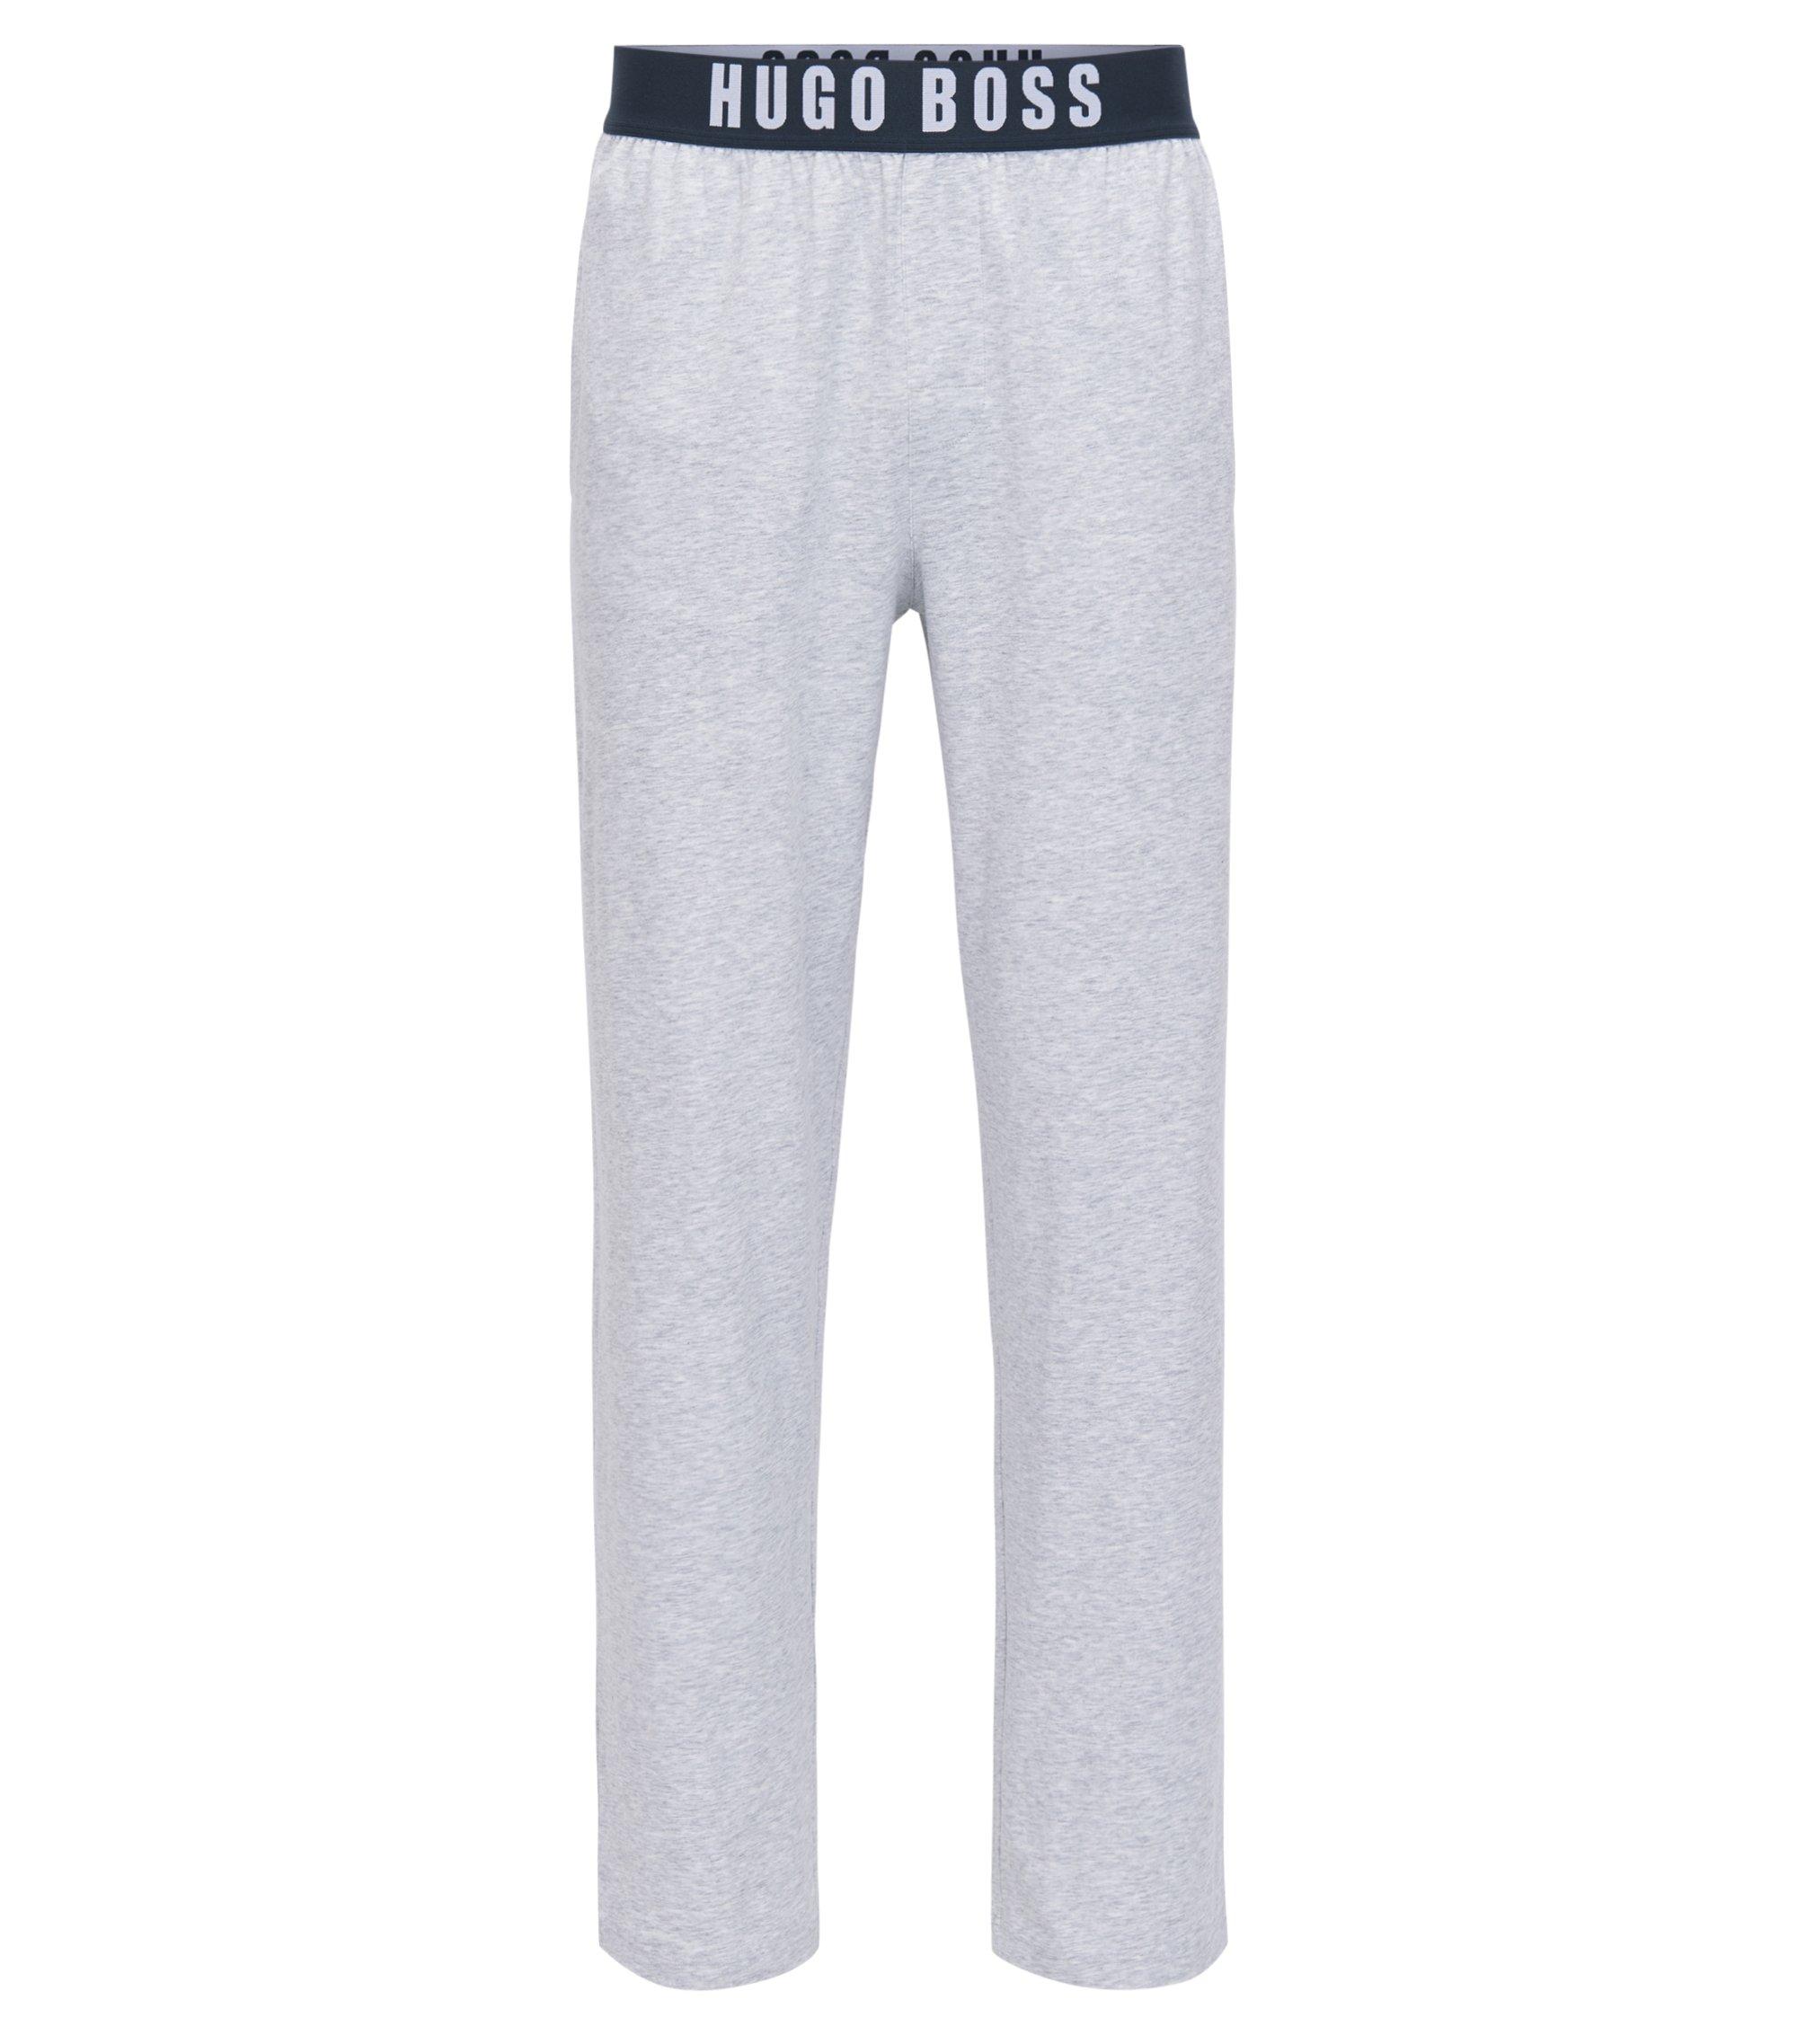 Bas de pyjama en jersey de coton stretch, Gris